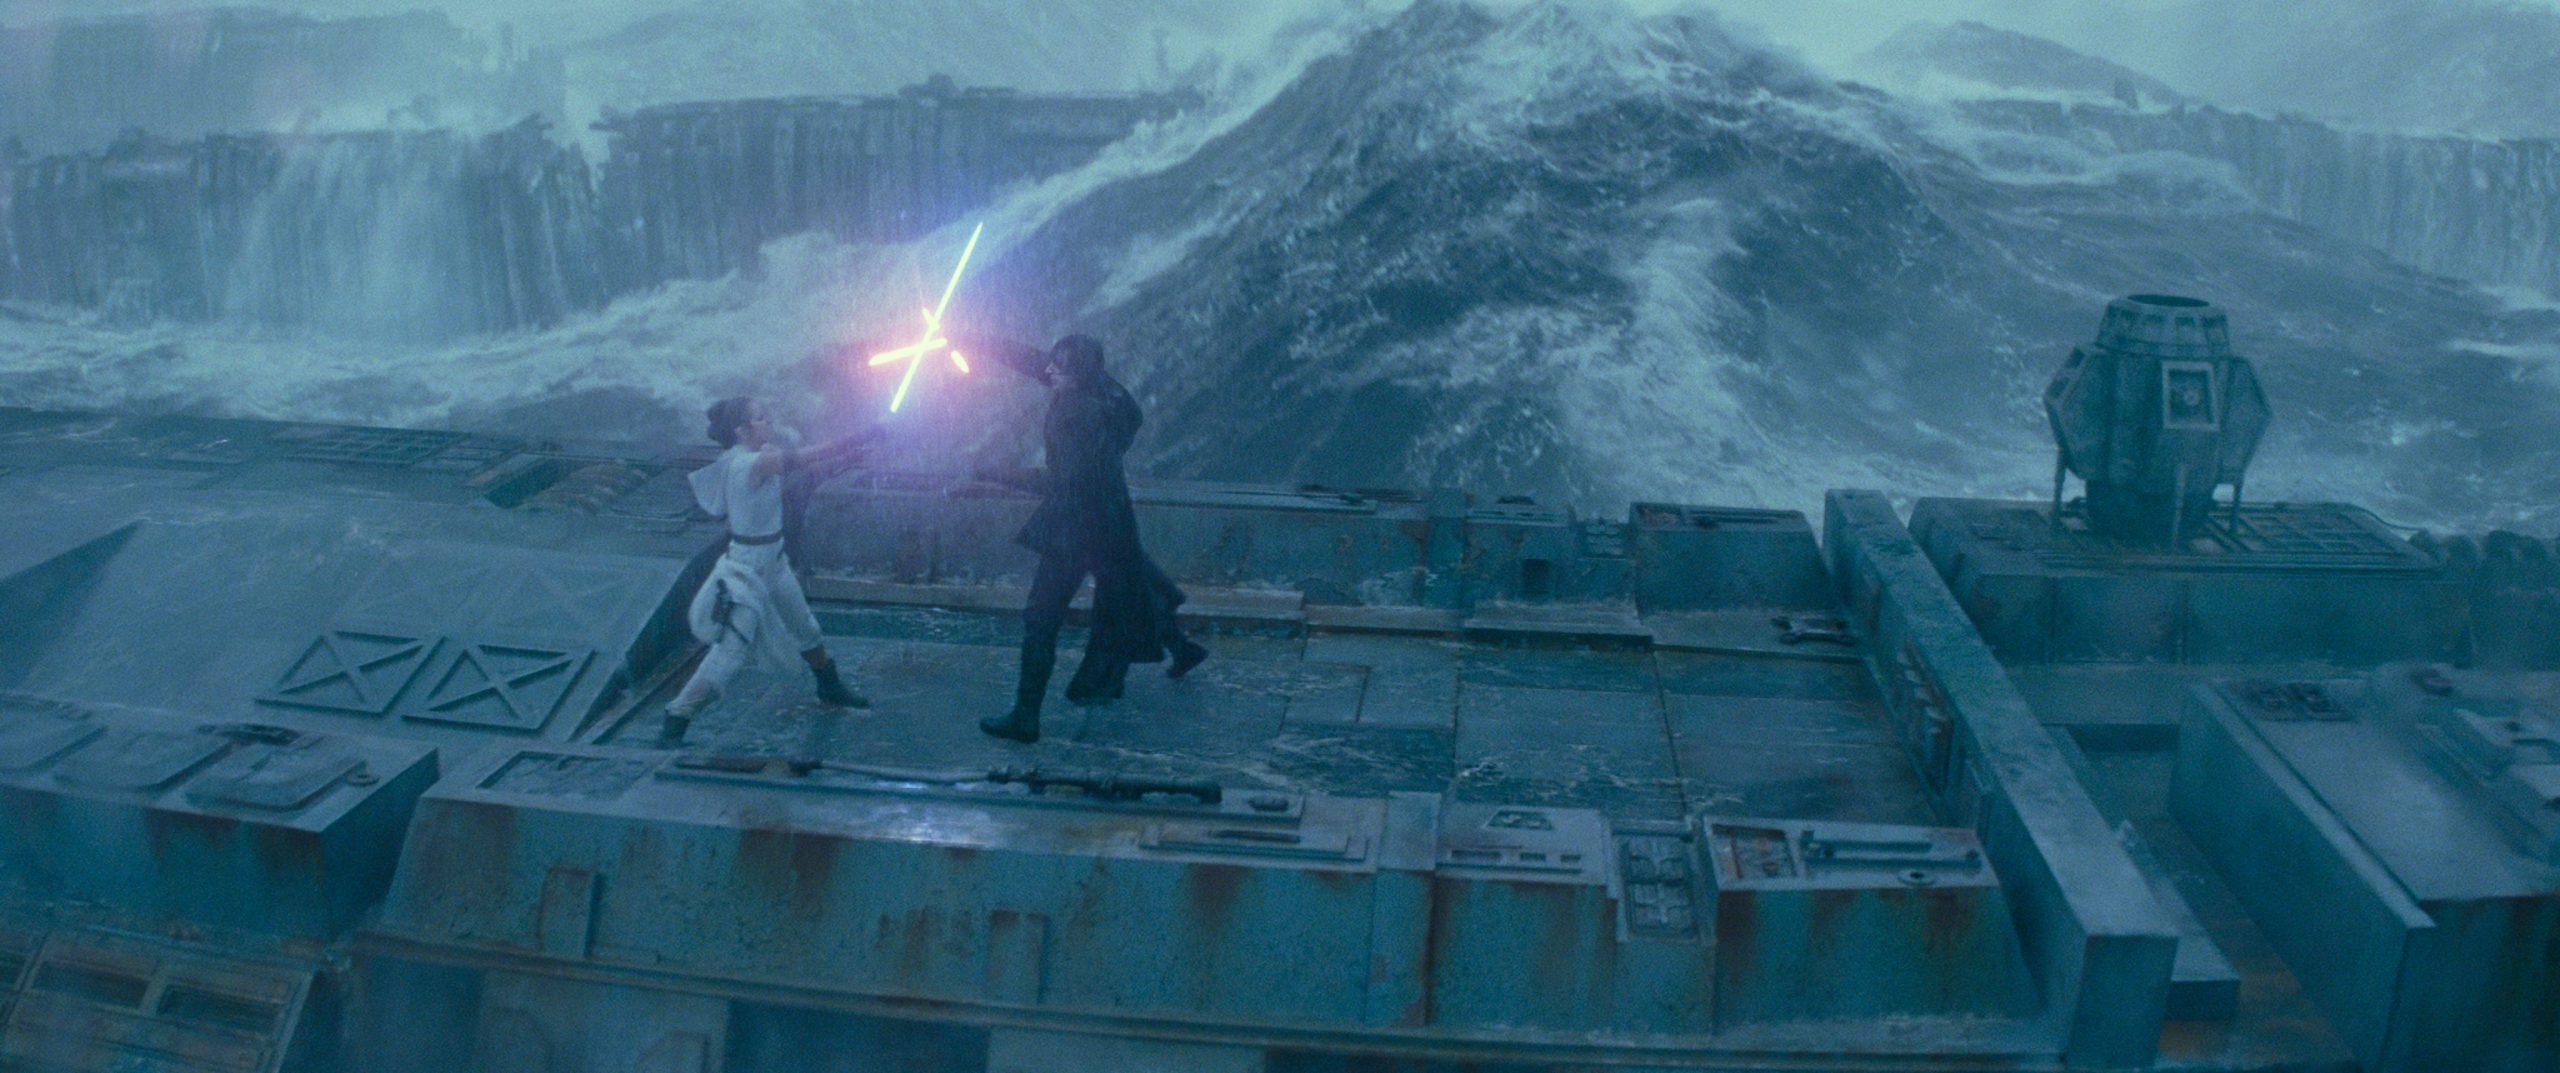 Movie Review Star Wars Episode Ix The Rise Of Skywalker Mynock Manor